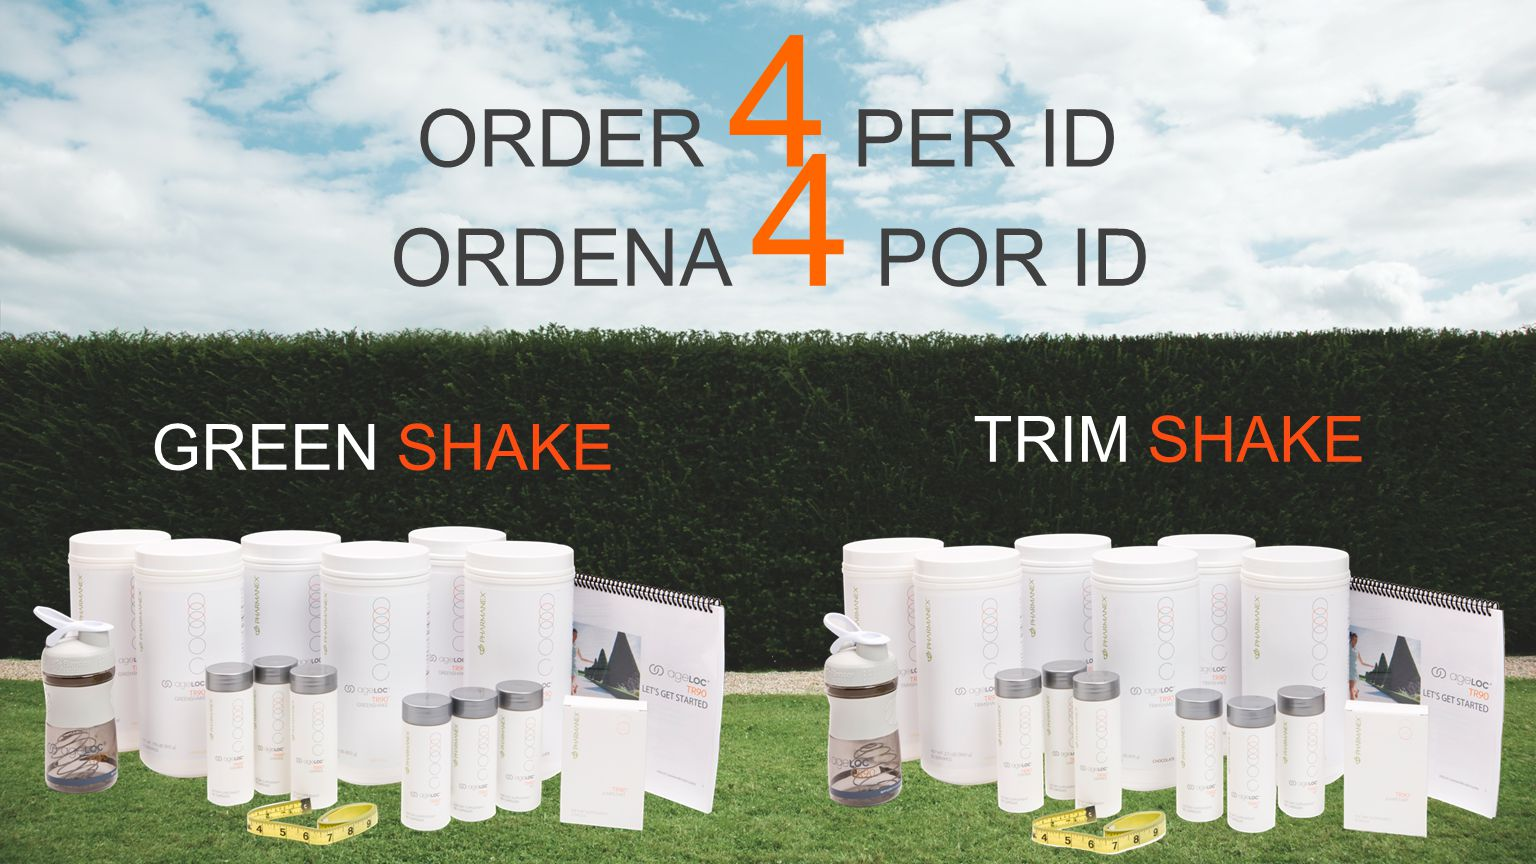 ORDER 4 PER ID GREEN SHAKE TRIM SHAKE ORDENA 4 POR ID